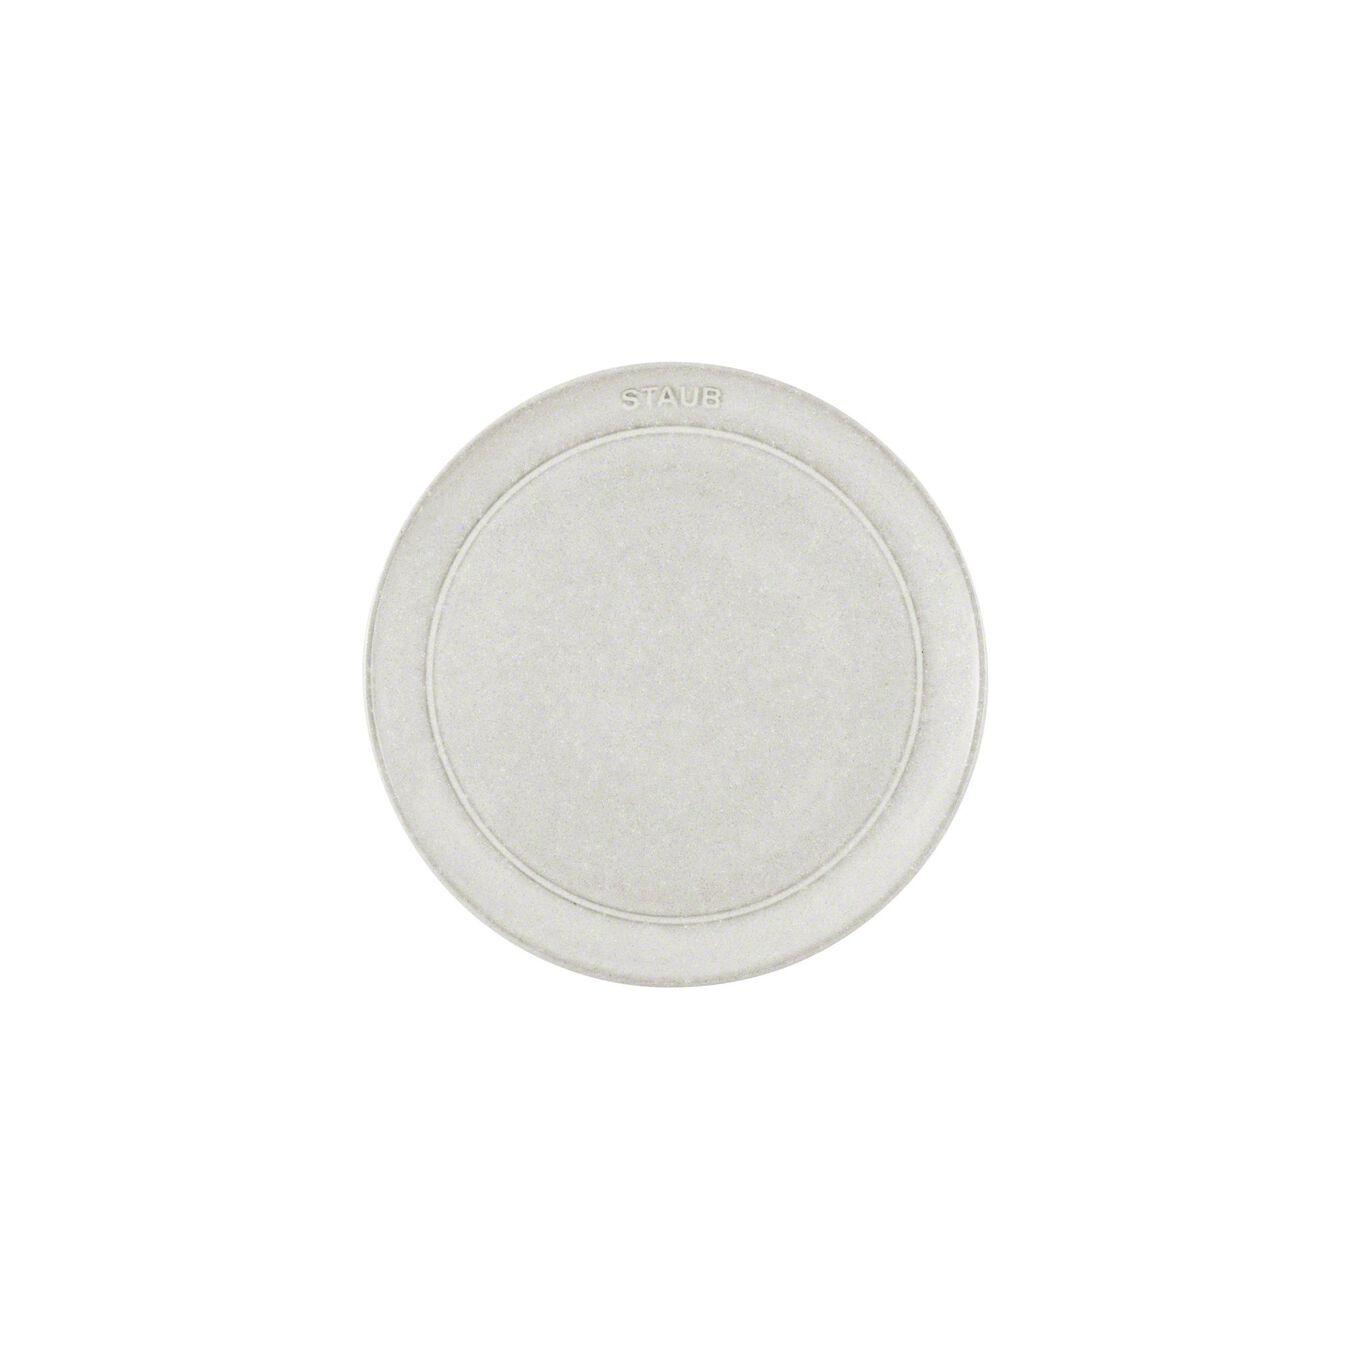 20 cm Ceramic round Plate flat, White Truffle,,large 3